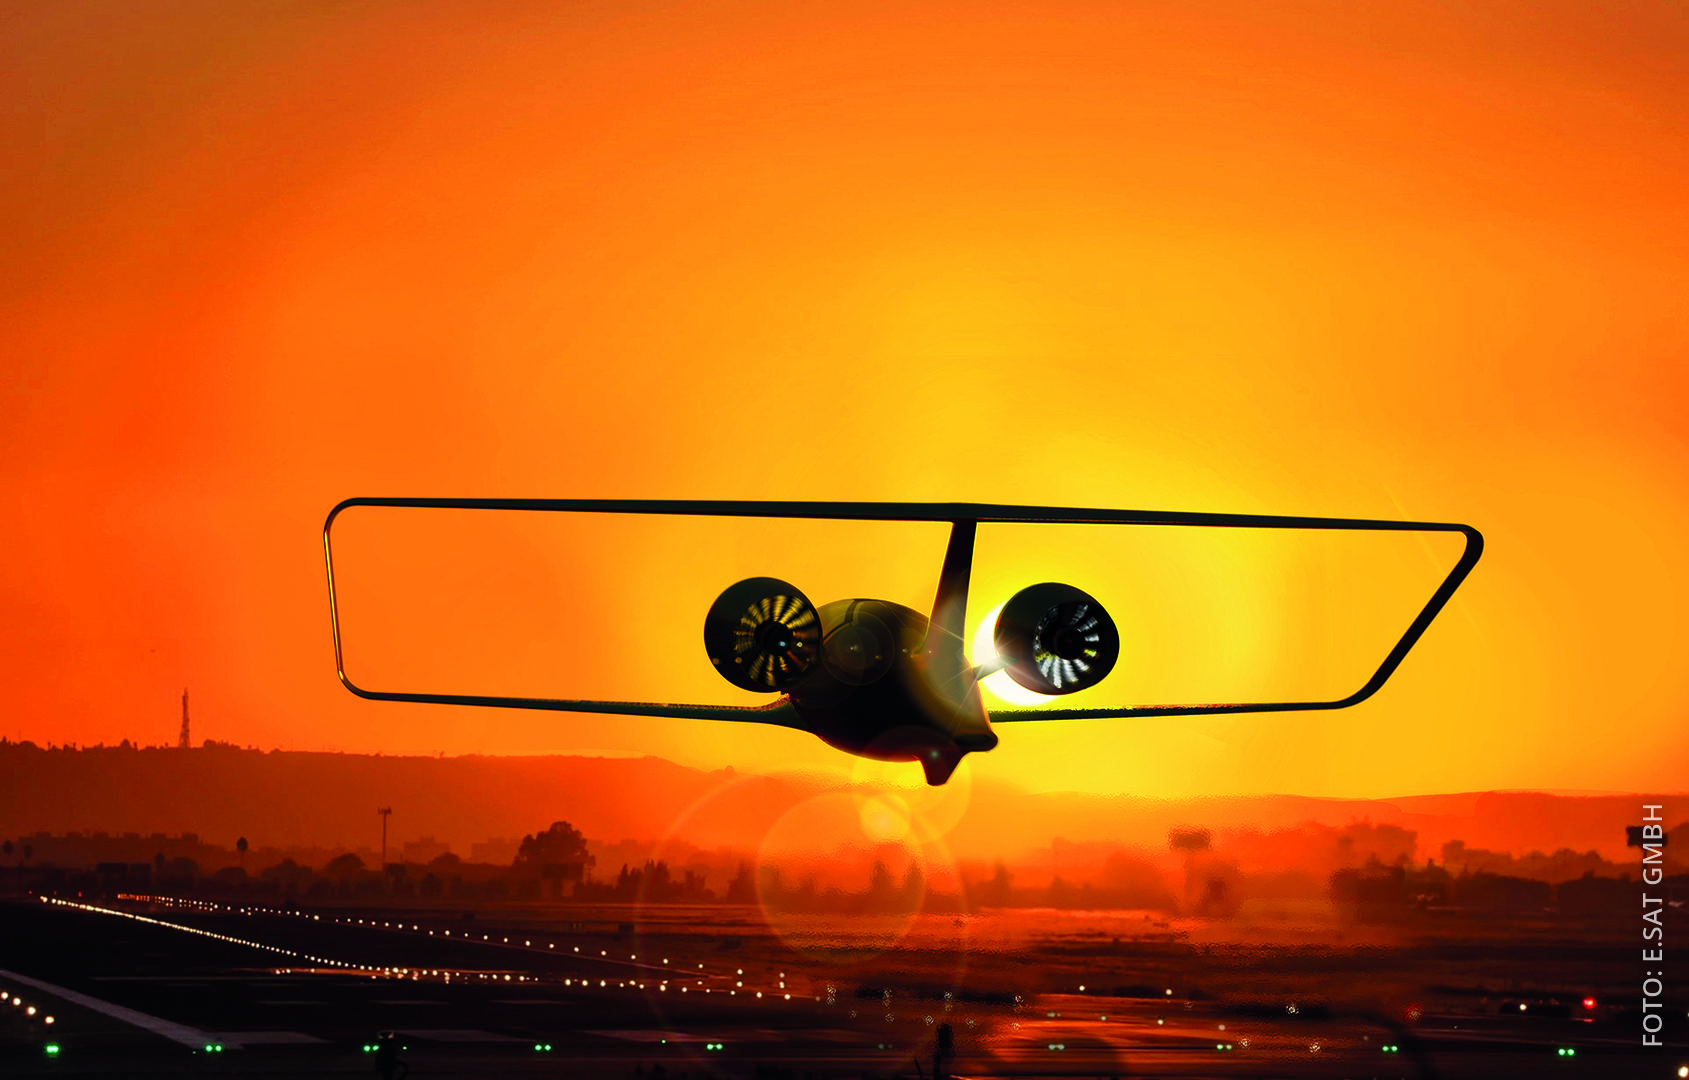 Ein Flugtaxi der Firma e.SAT startet